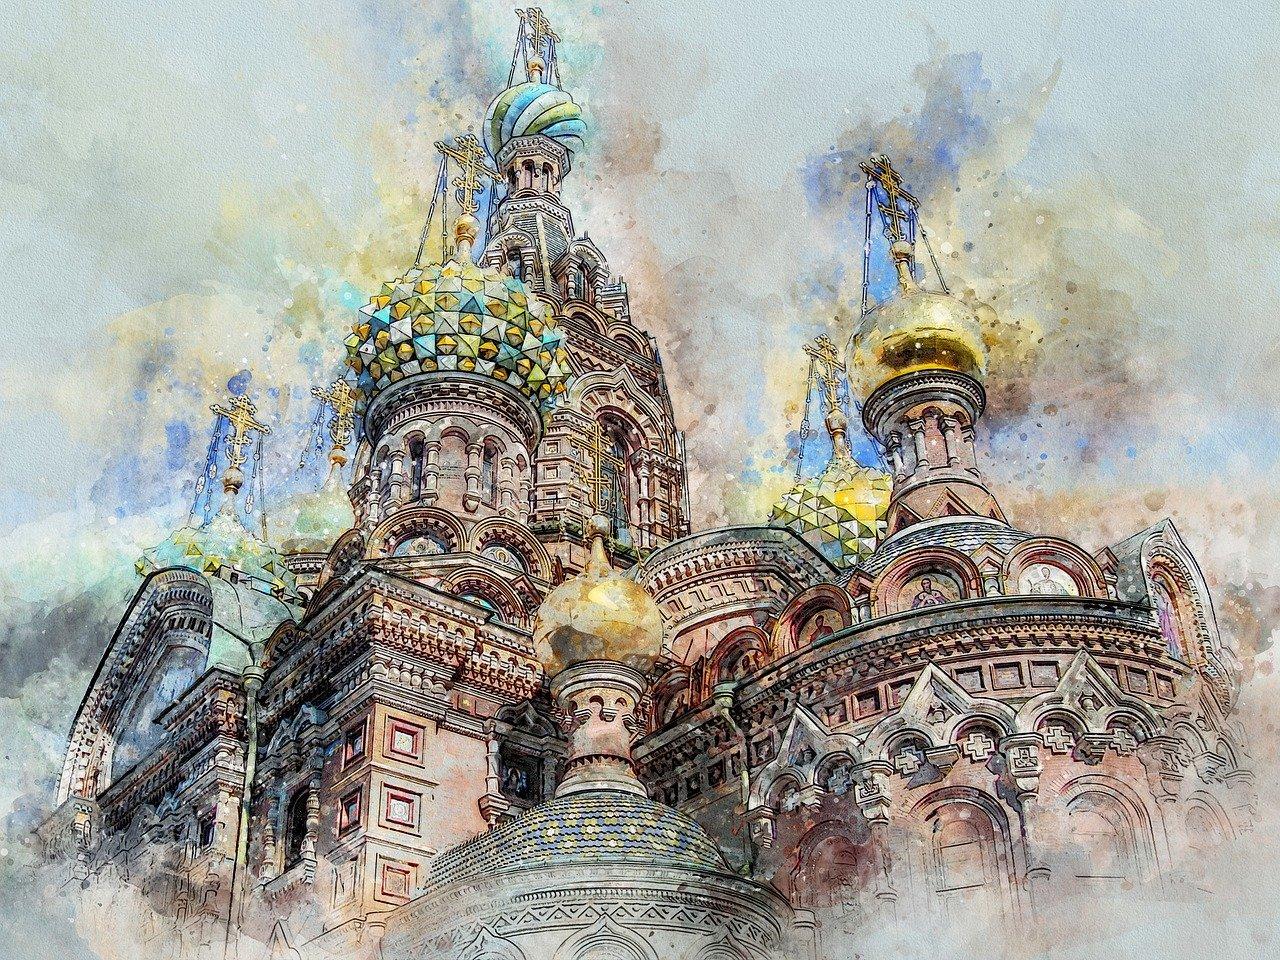 Глава ЦБ РФ: Цифровой рубль возможен до конца 2021 года